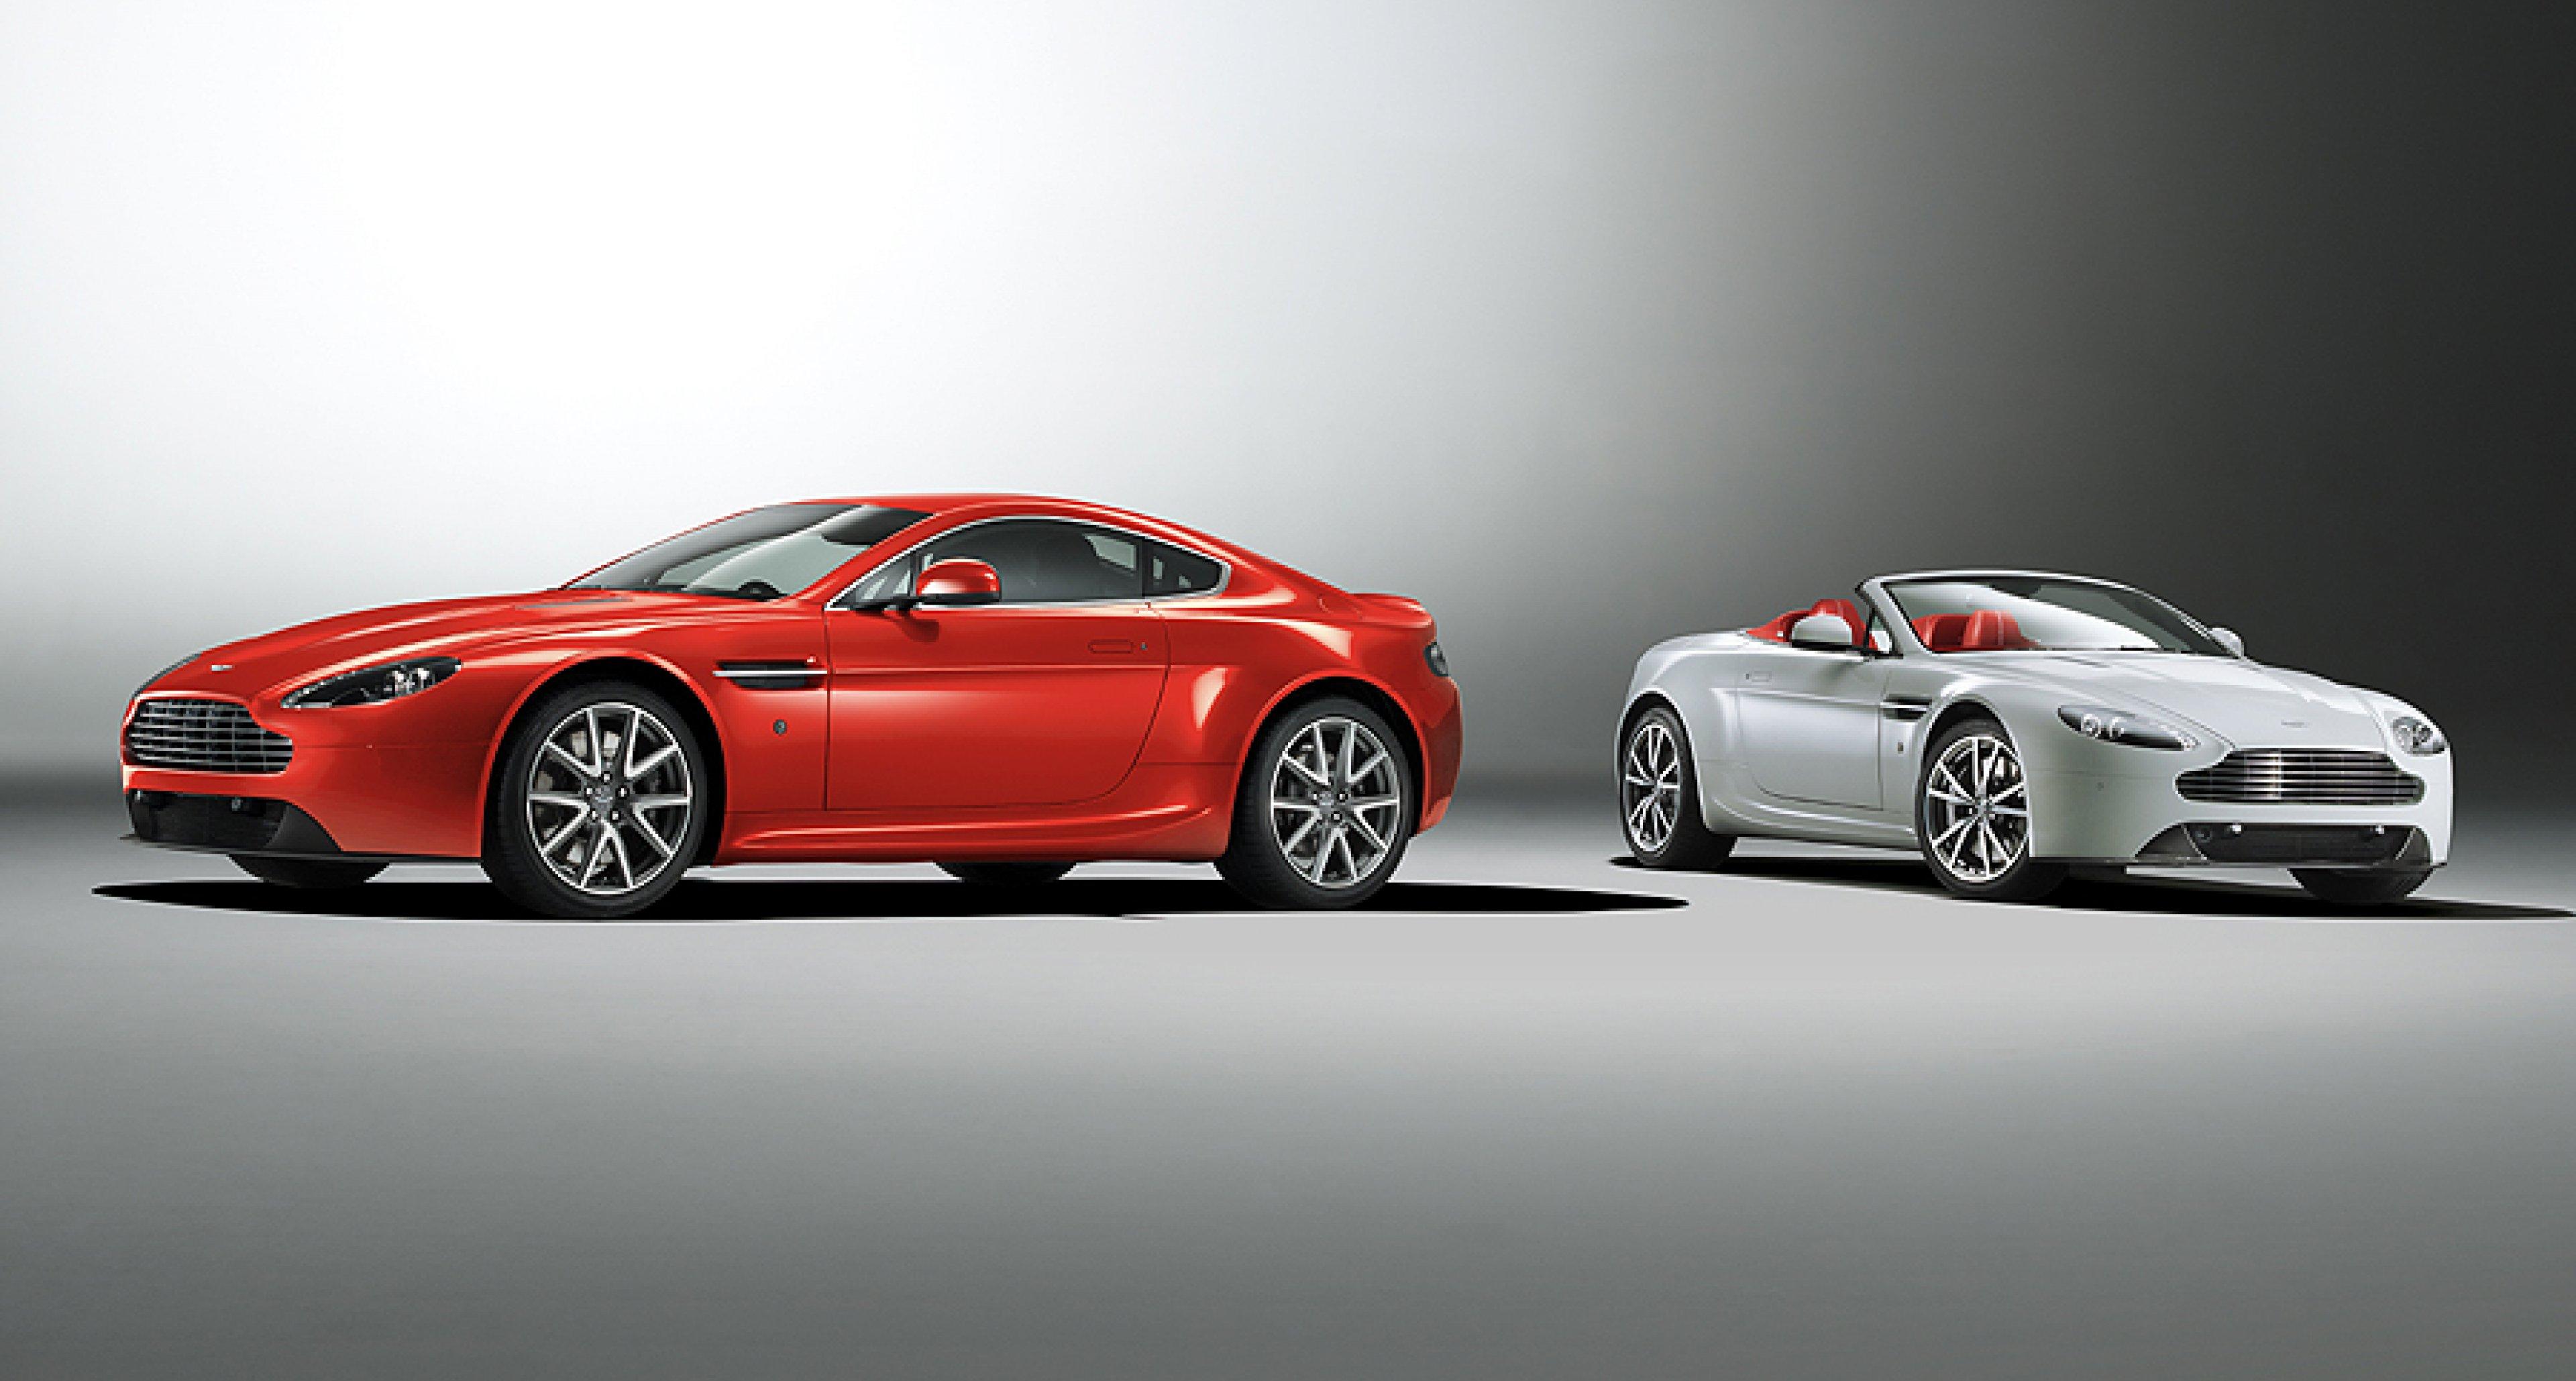 Aston Martin Vantage 2012: Modellpflege